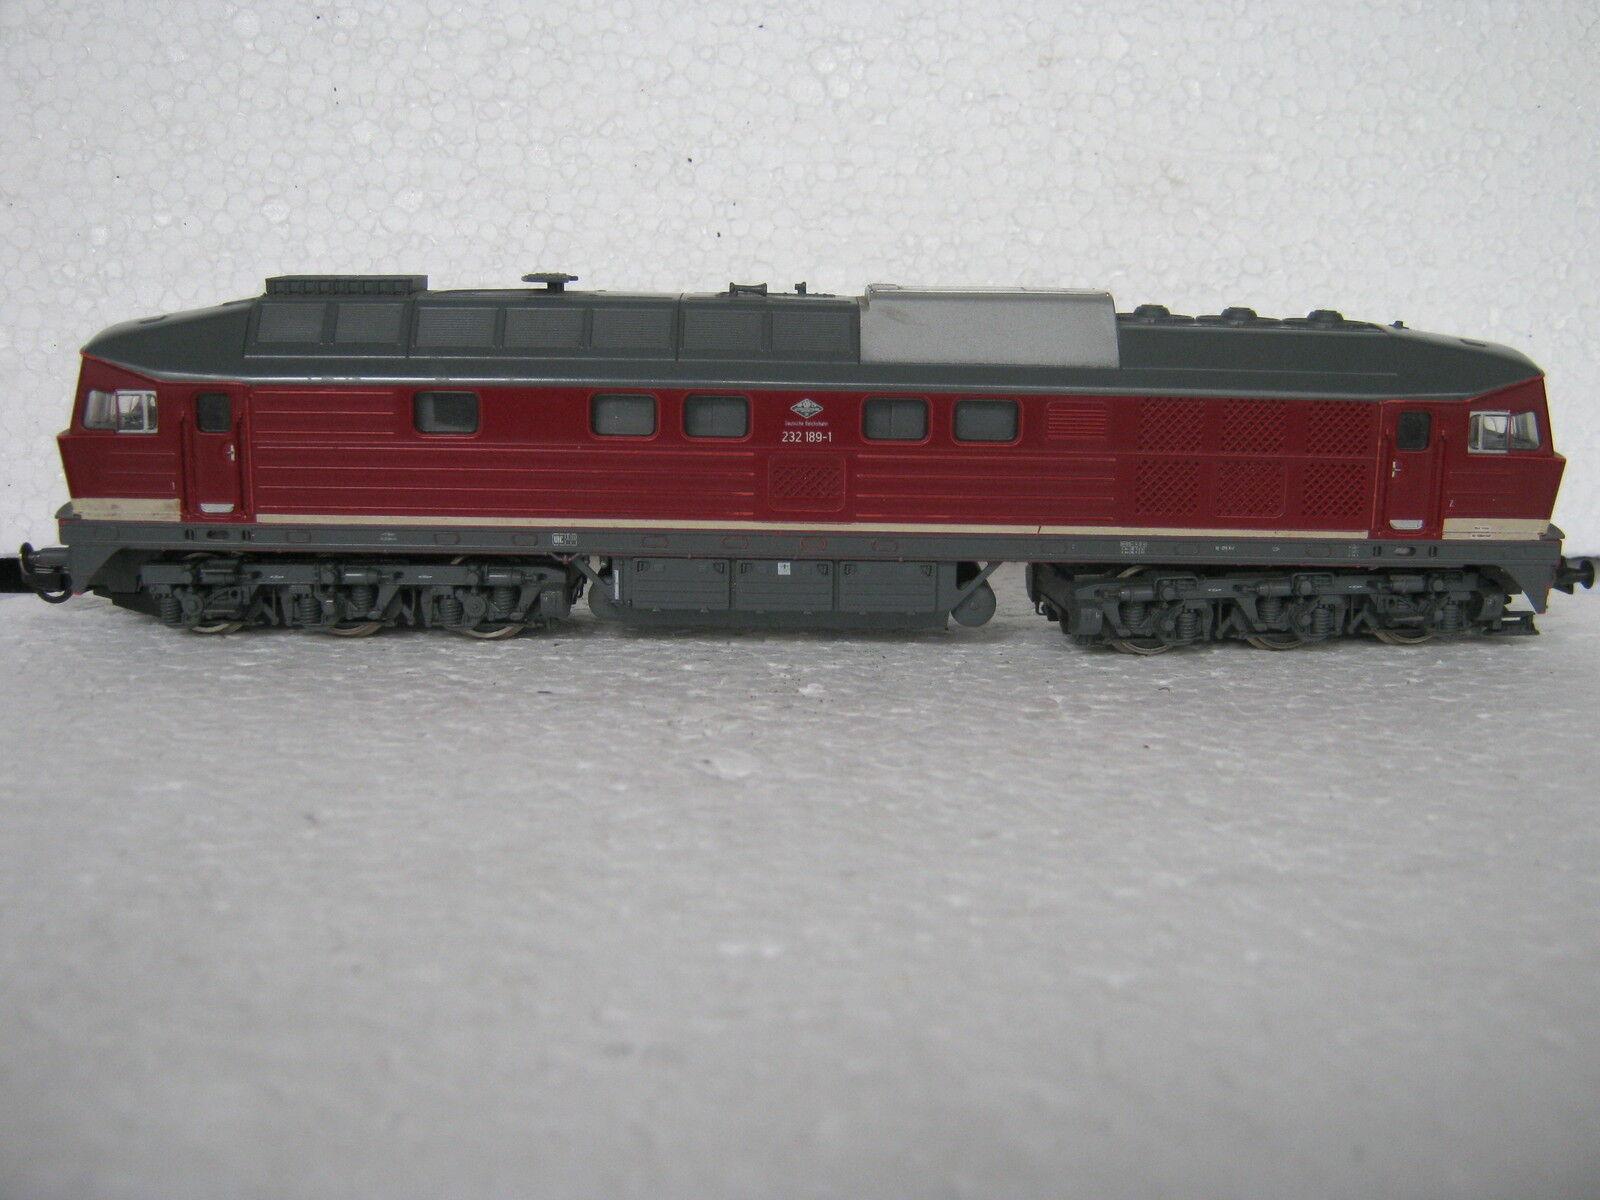 Digital ROCO HO DC 43955 Diesel Locomotive Ludmilla BR 232 189-1 Dr (rg cb 233-71s3 6)